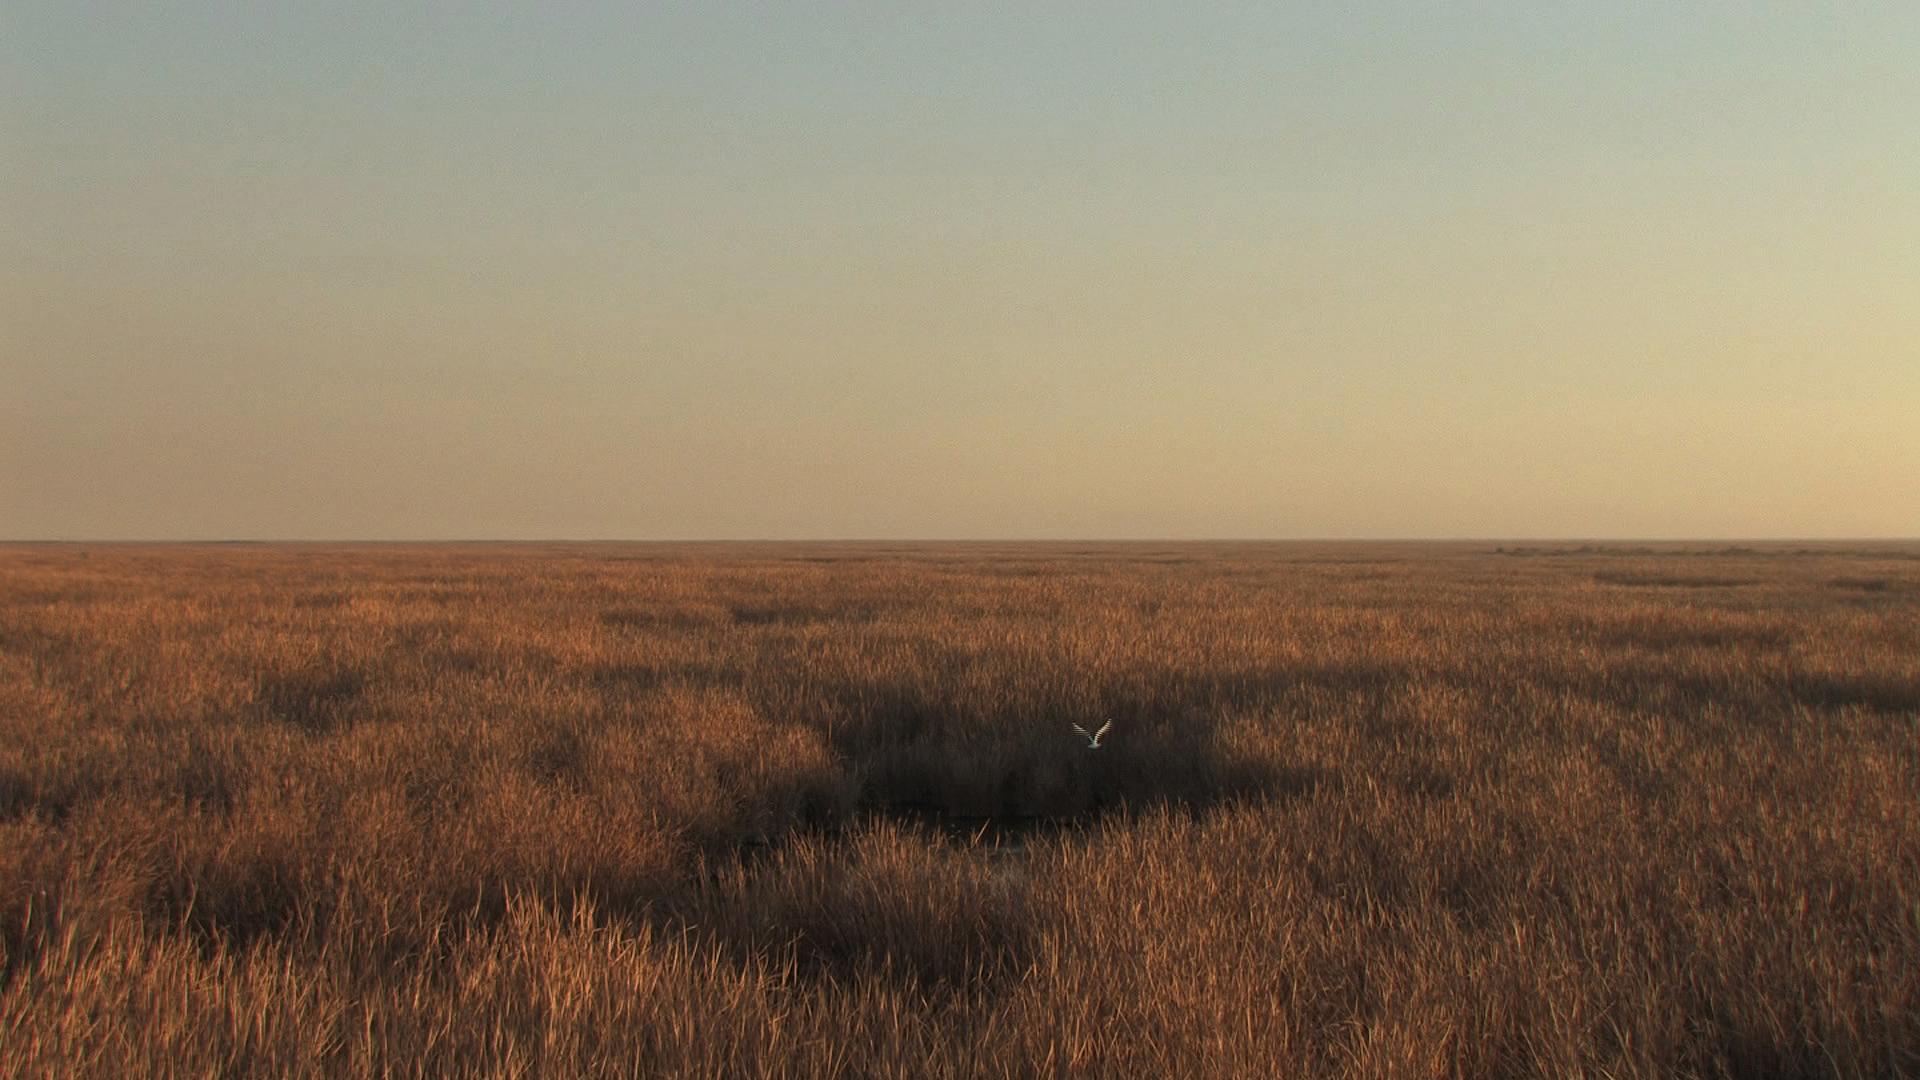 Still from Three Transnational Wetlands (La Cienega de Santa Clara), 2012, single-channel color video, running time: 2.5 minutes.